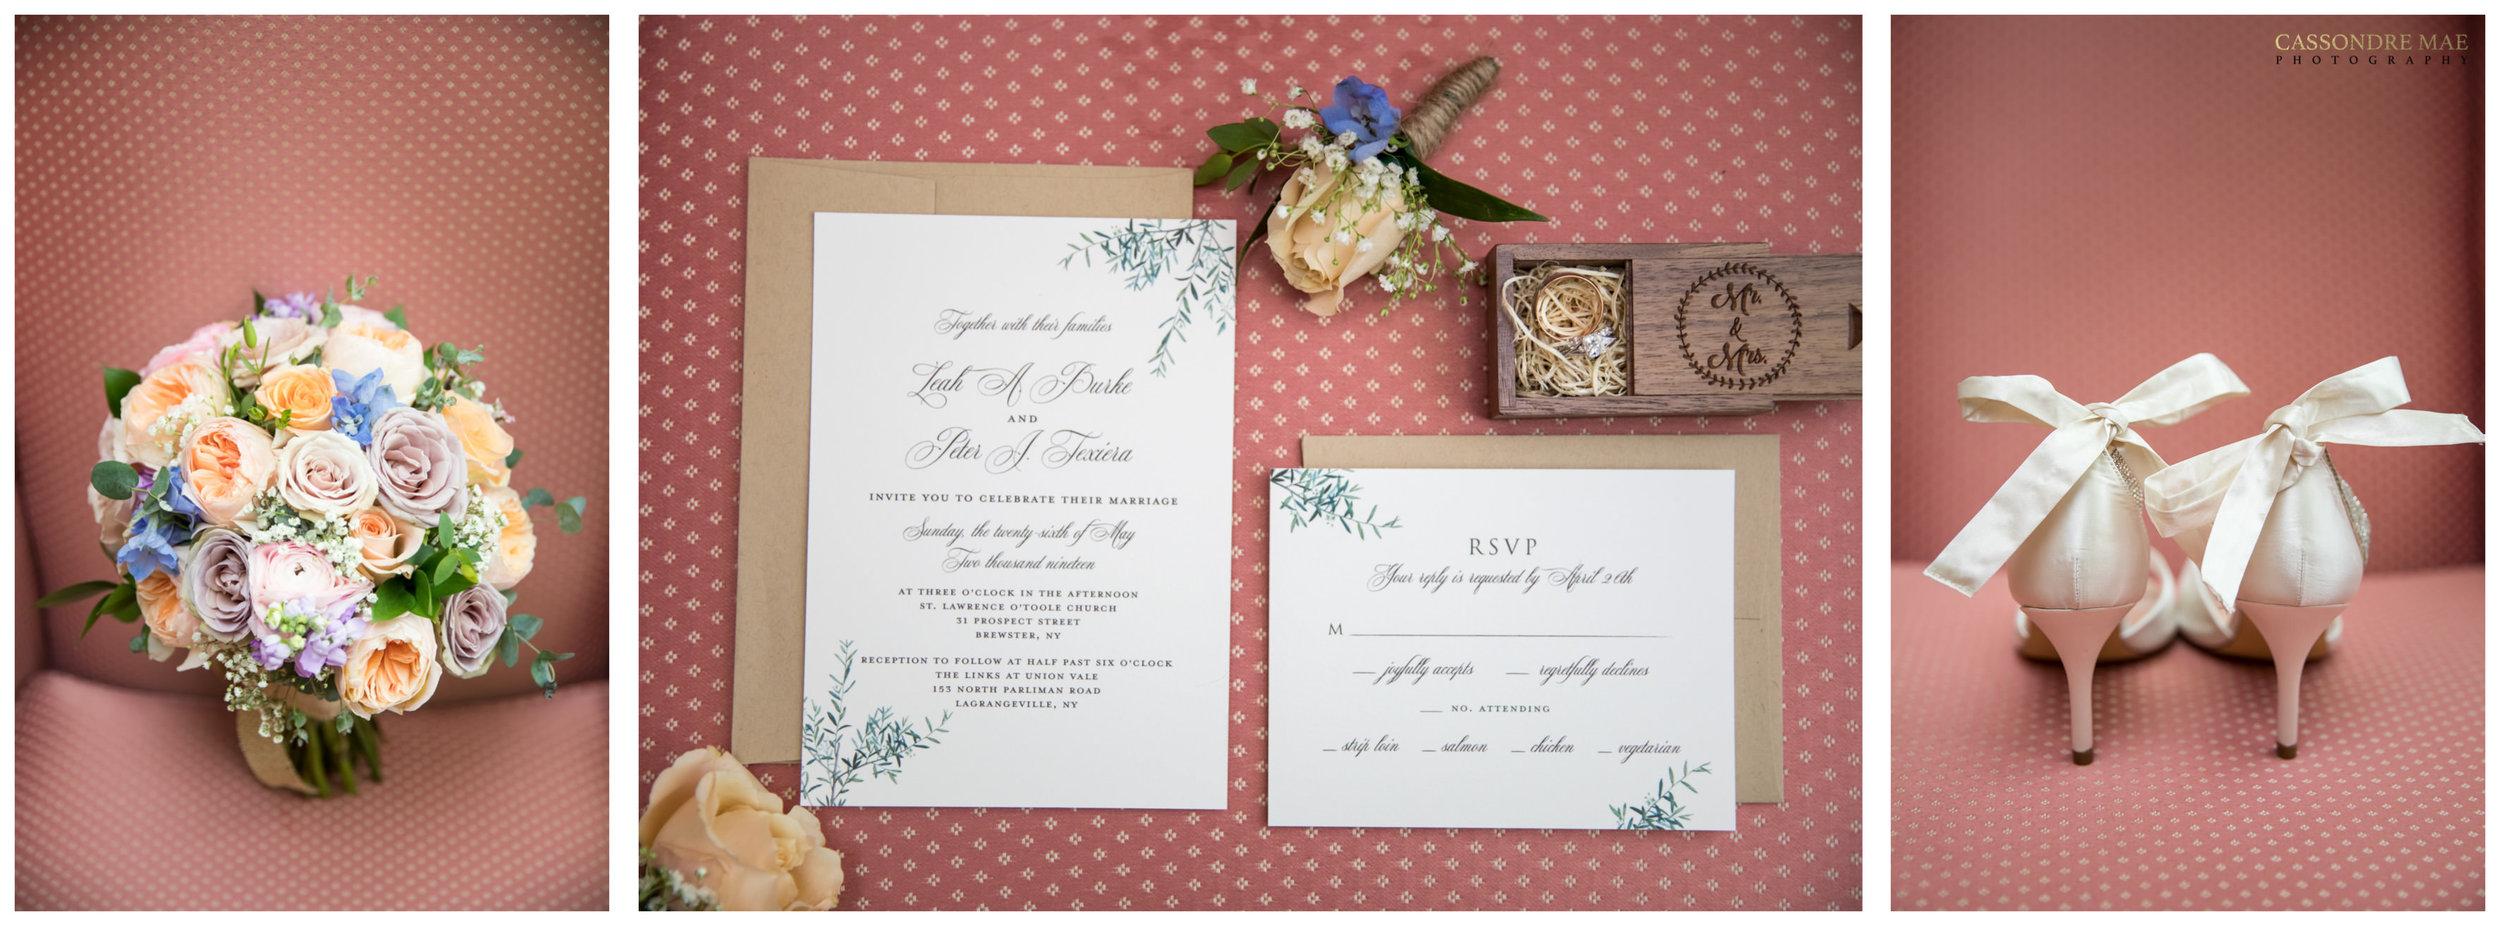 Cassondre Mae Photography Links at Unionvale Wedding 2.jpg